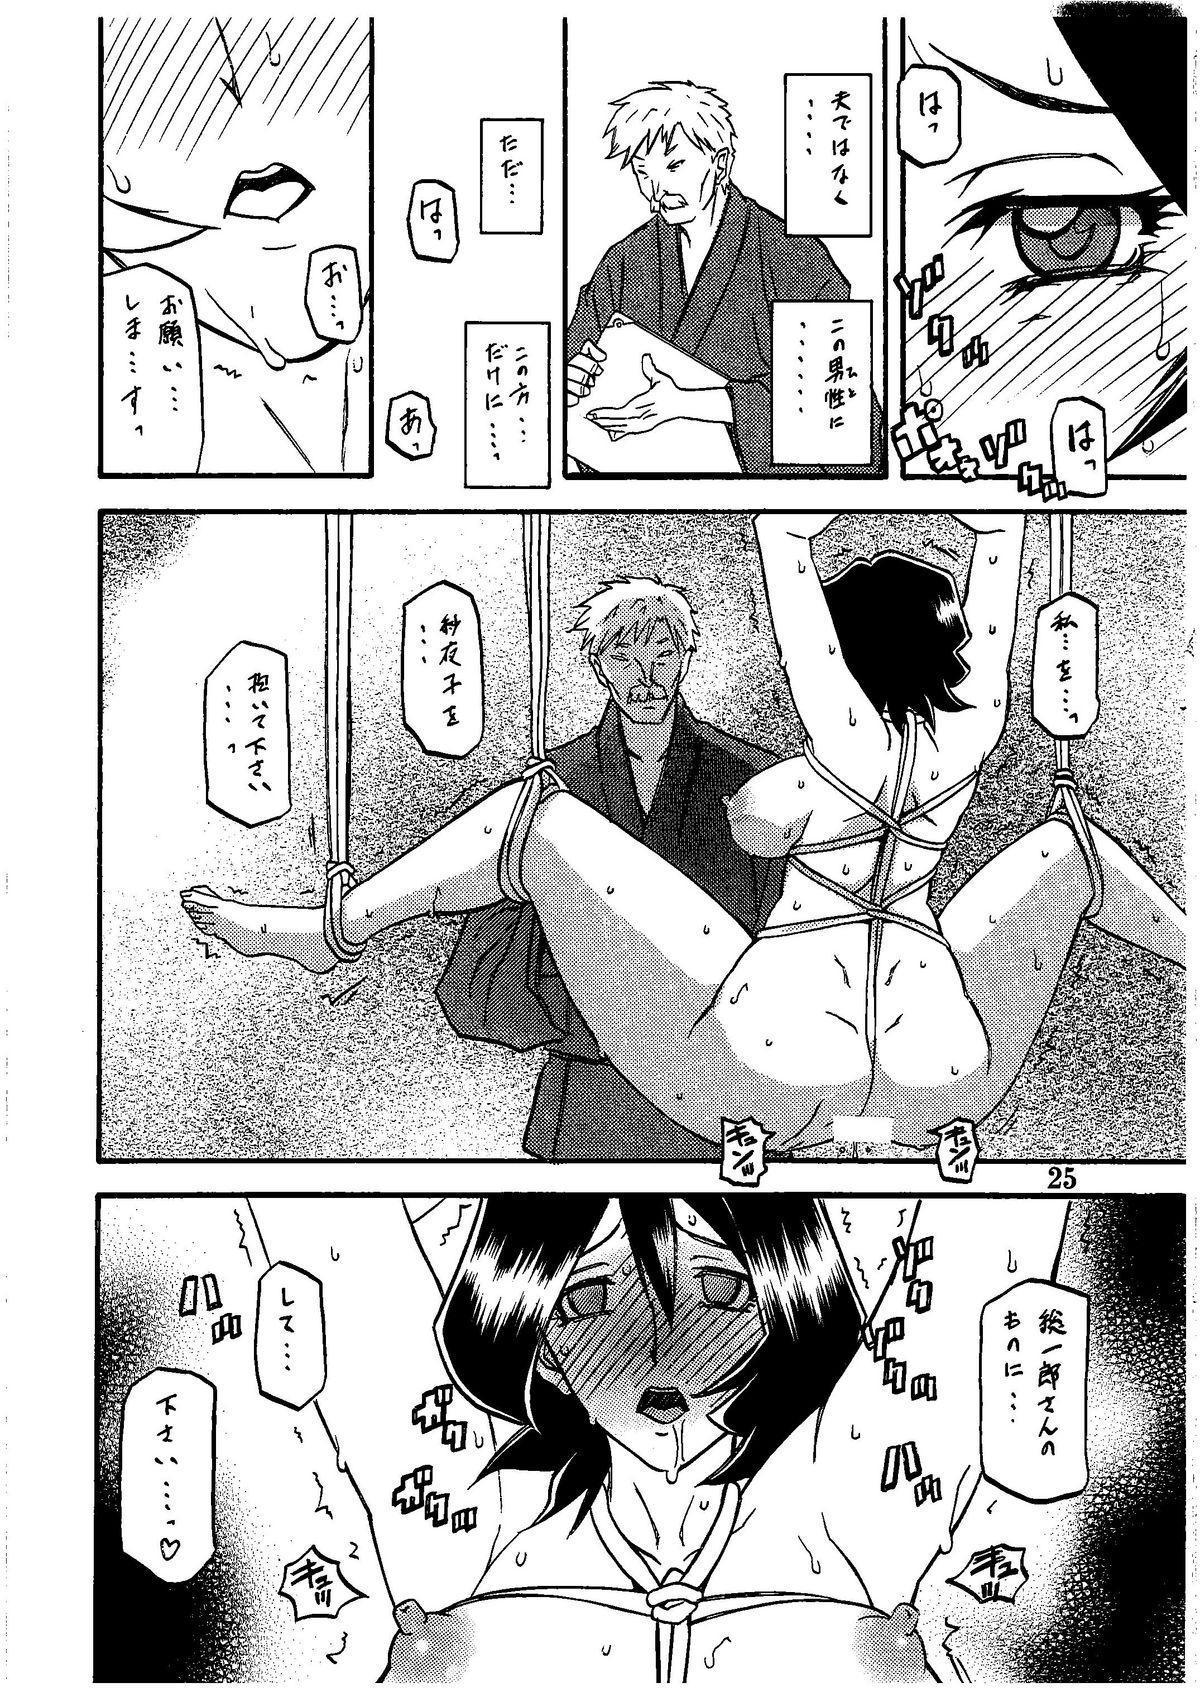 Saneishou 28